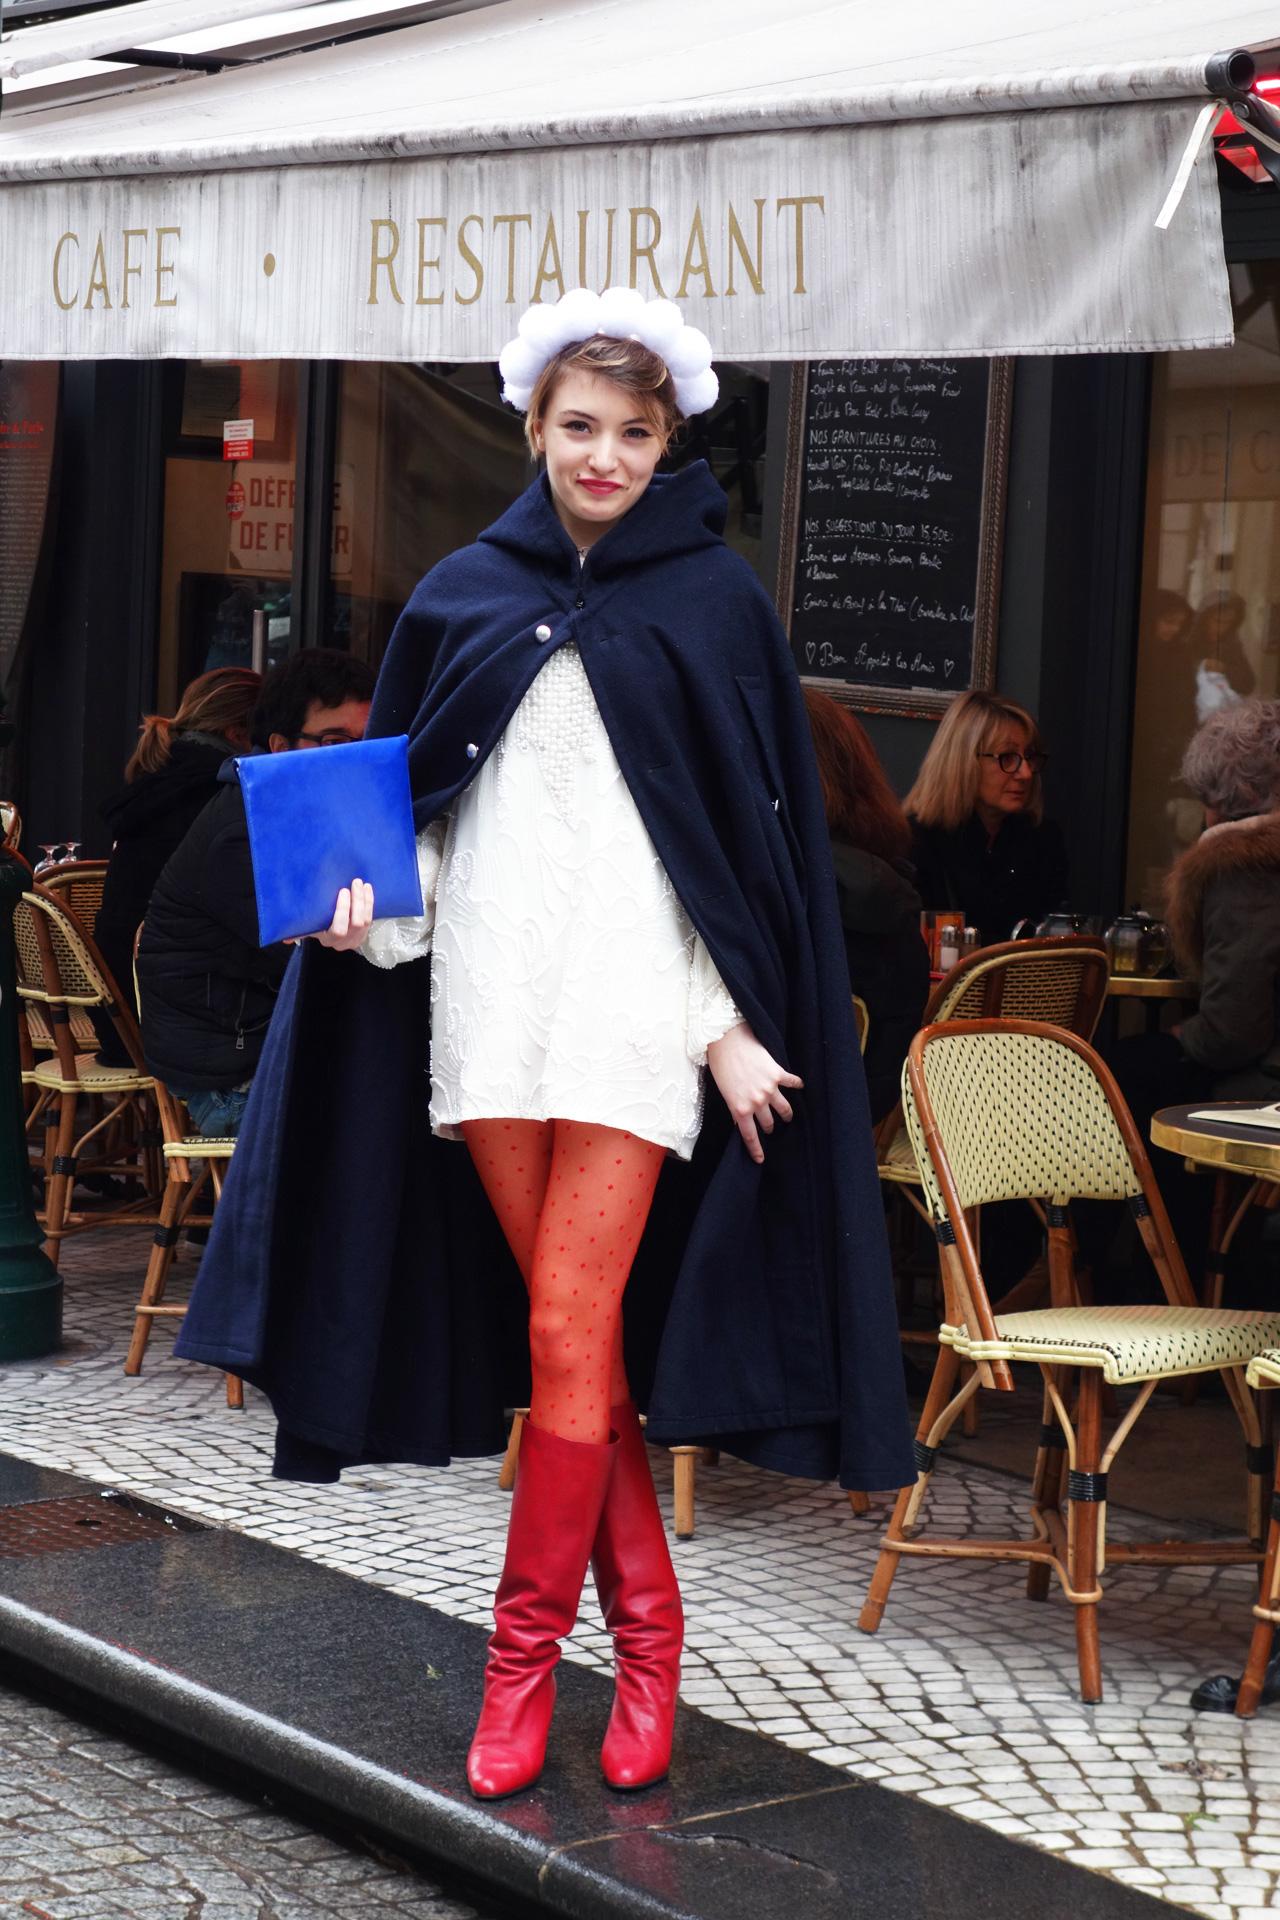 Mechtilde-streetstyle-haute-couture-2014-10